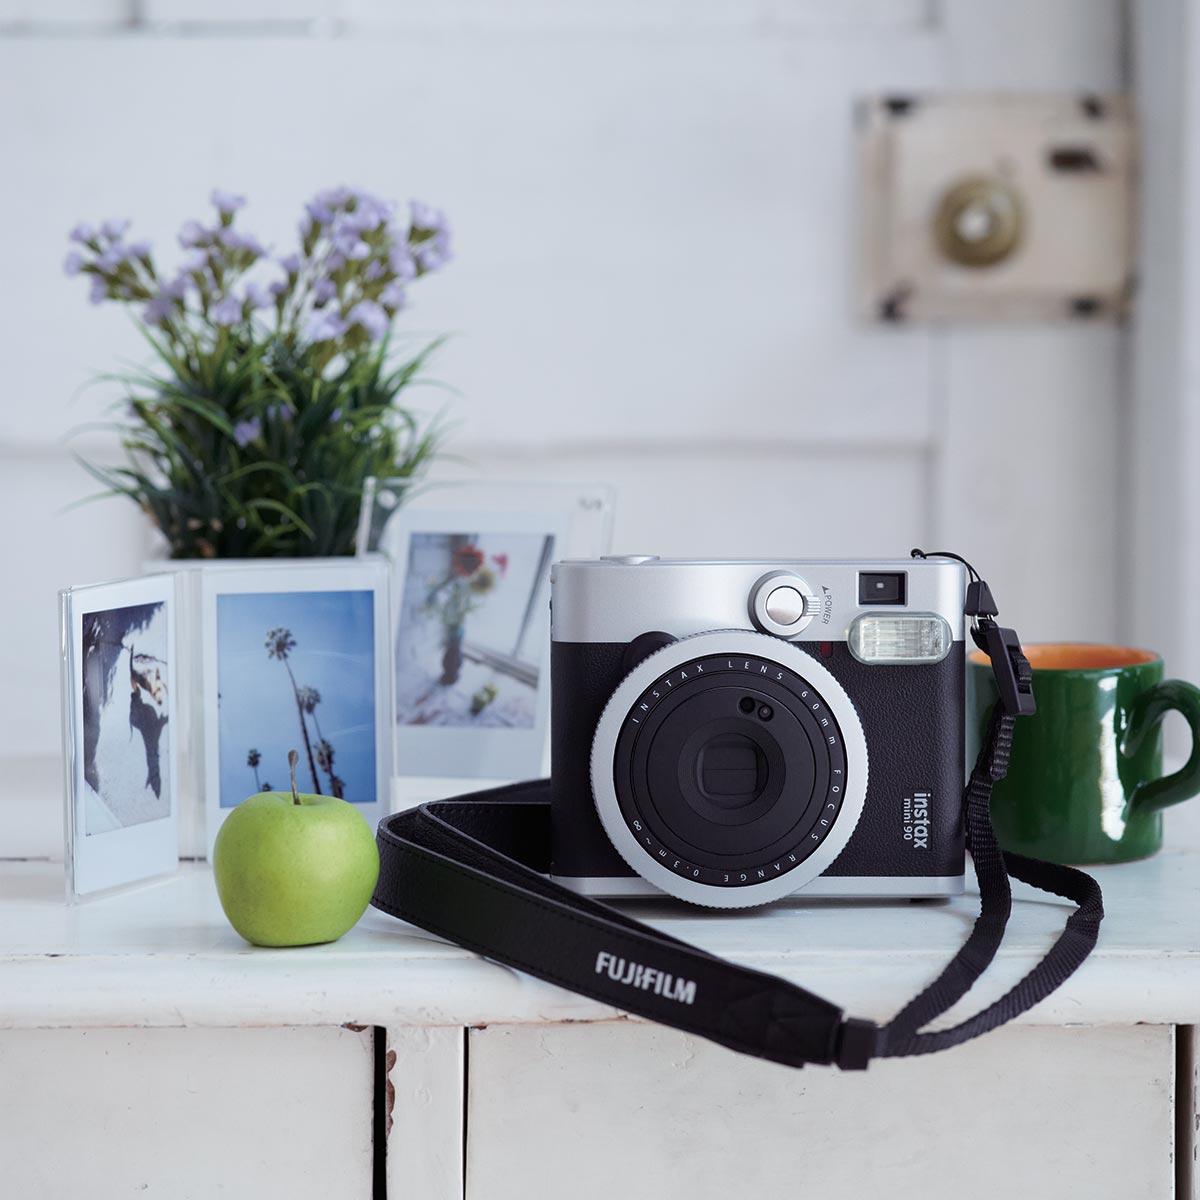 Fuji Instax Mini 90 Instant Camera's